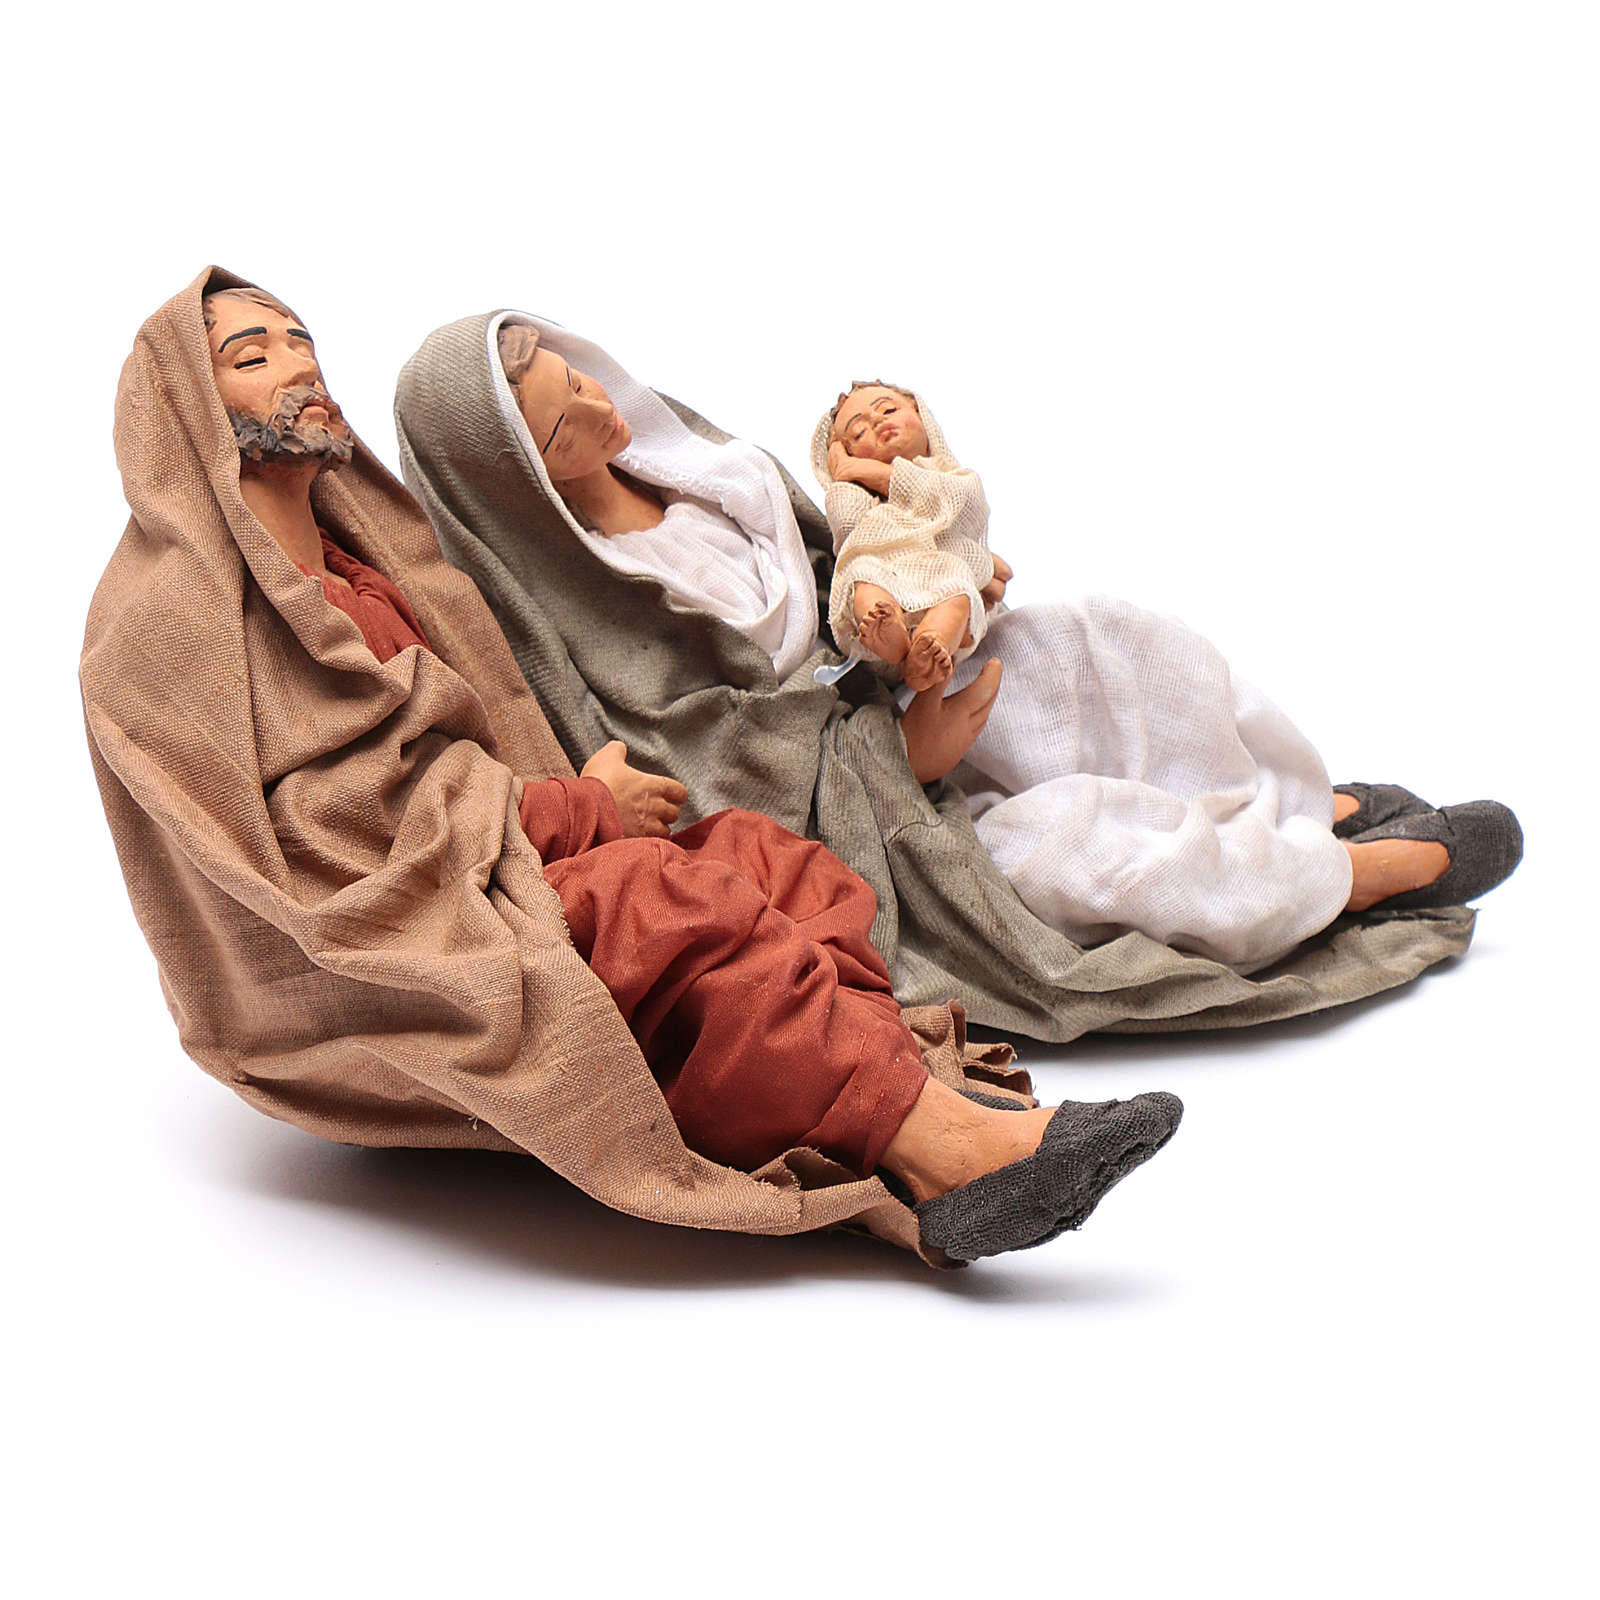 Neapolitan nativity scene Holy Family new povera 30 cm 4